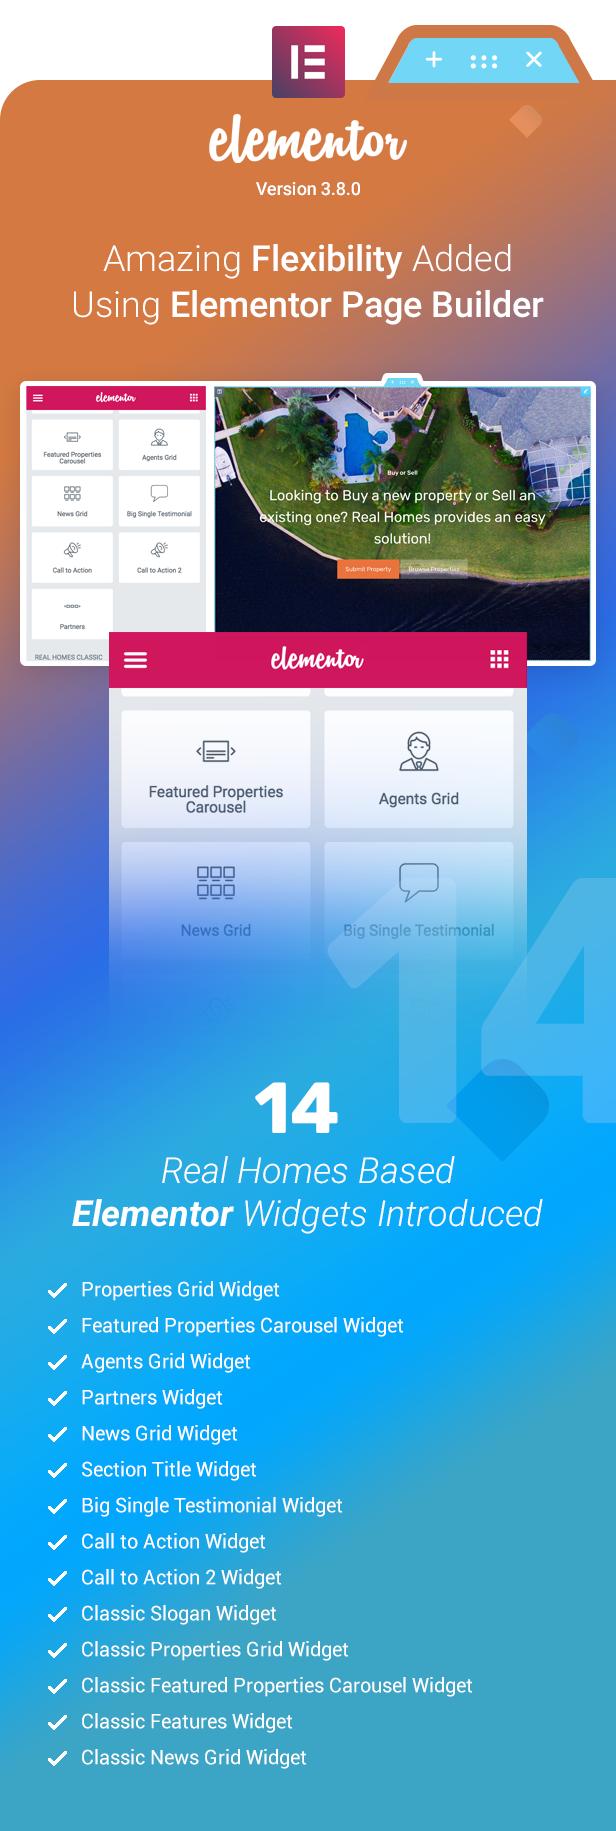 Amazing flexibility added using Elementor Page Builder